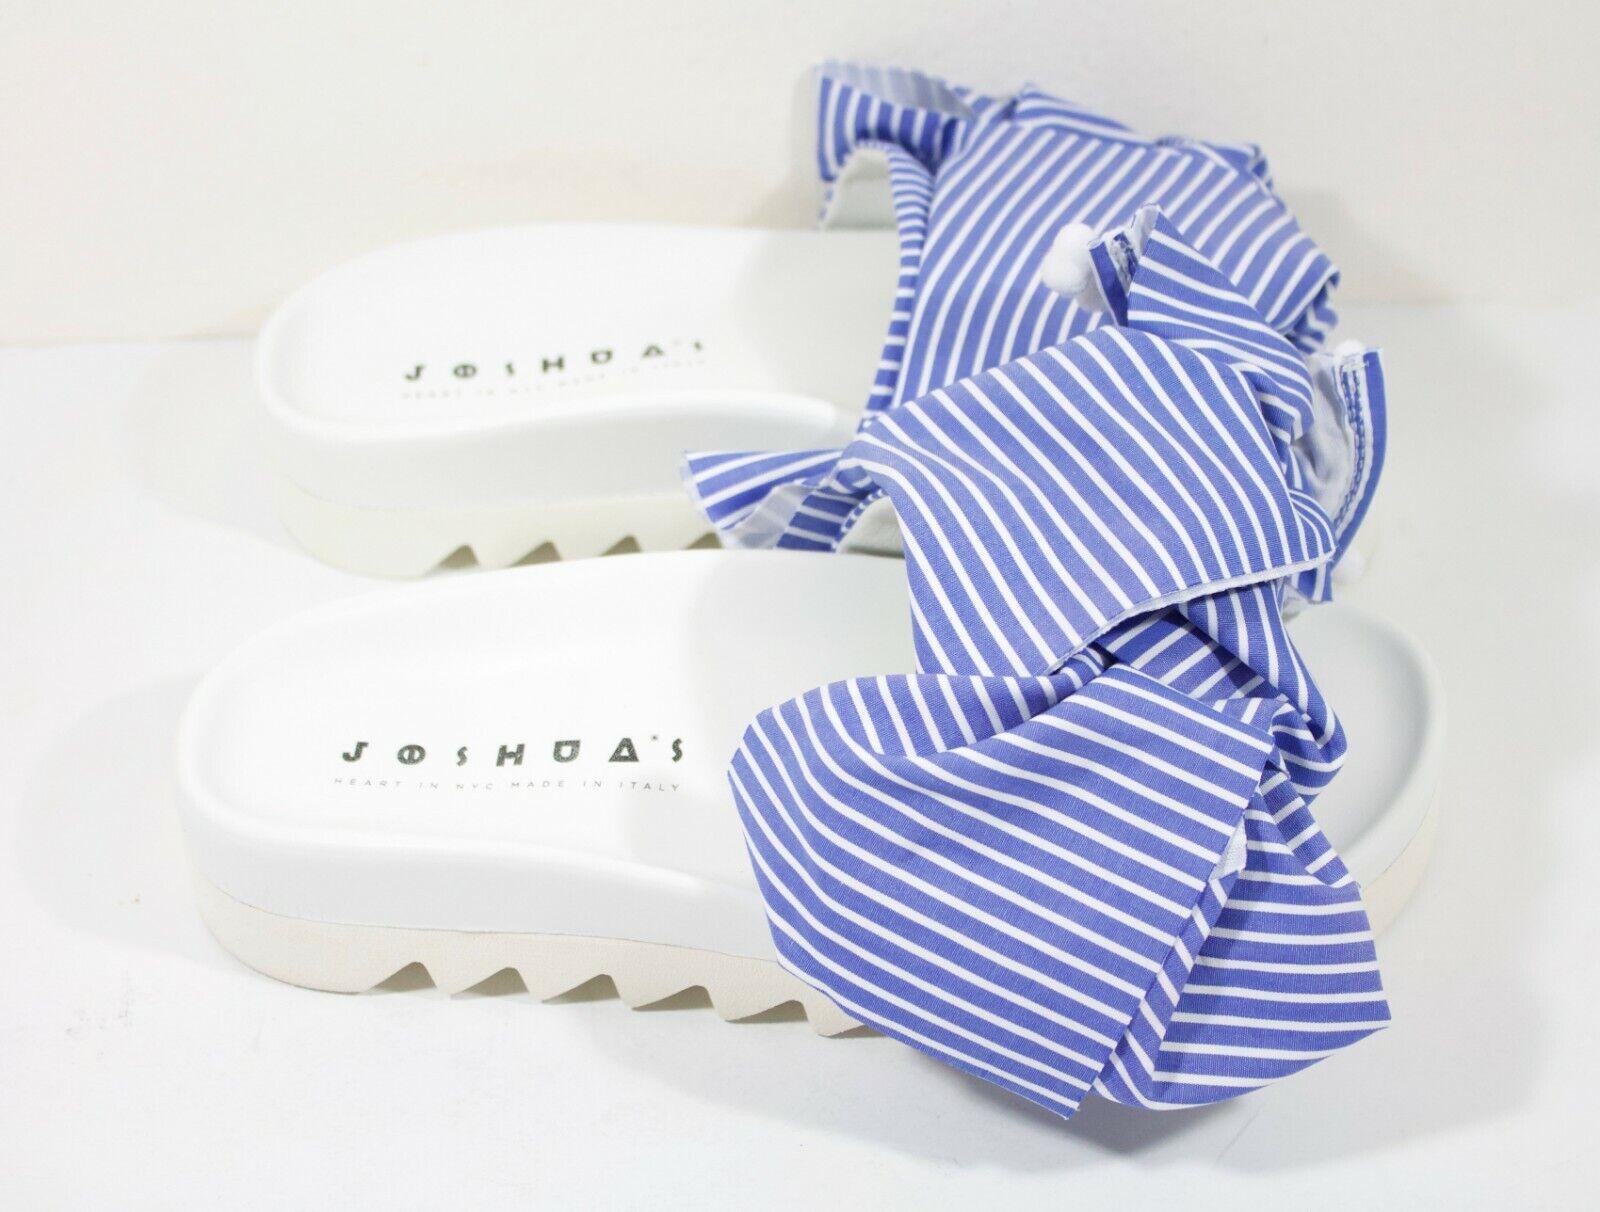 Joshua Sanders Wide Stripes Platform Bow Sandals bluee White Womens Size 38 US 8